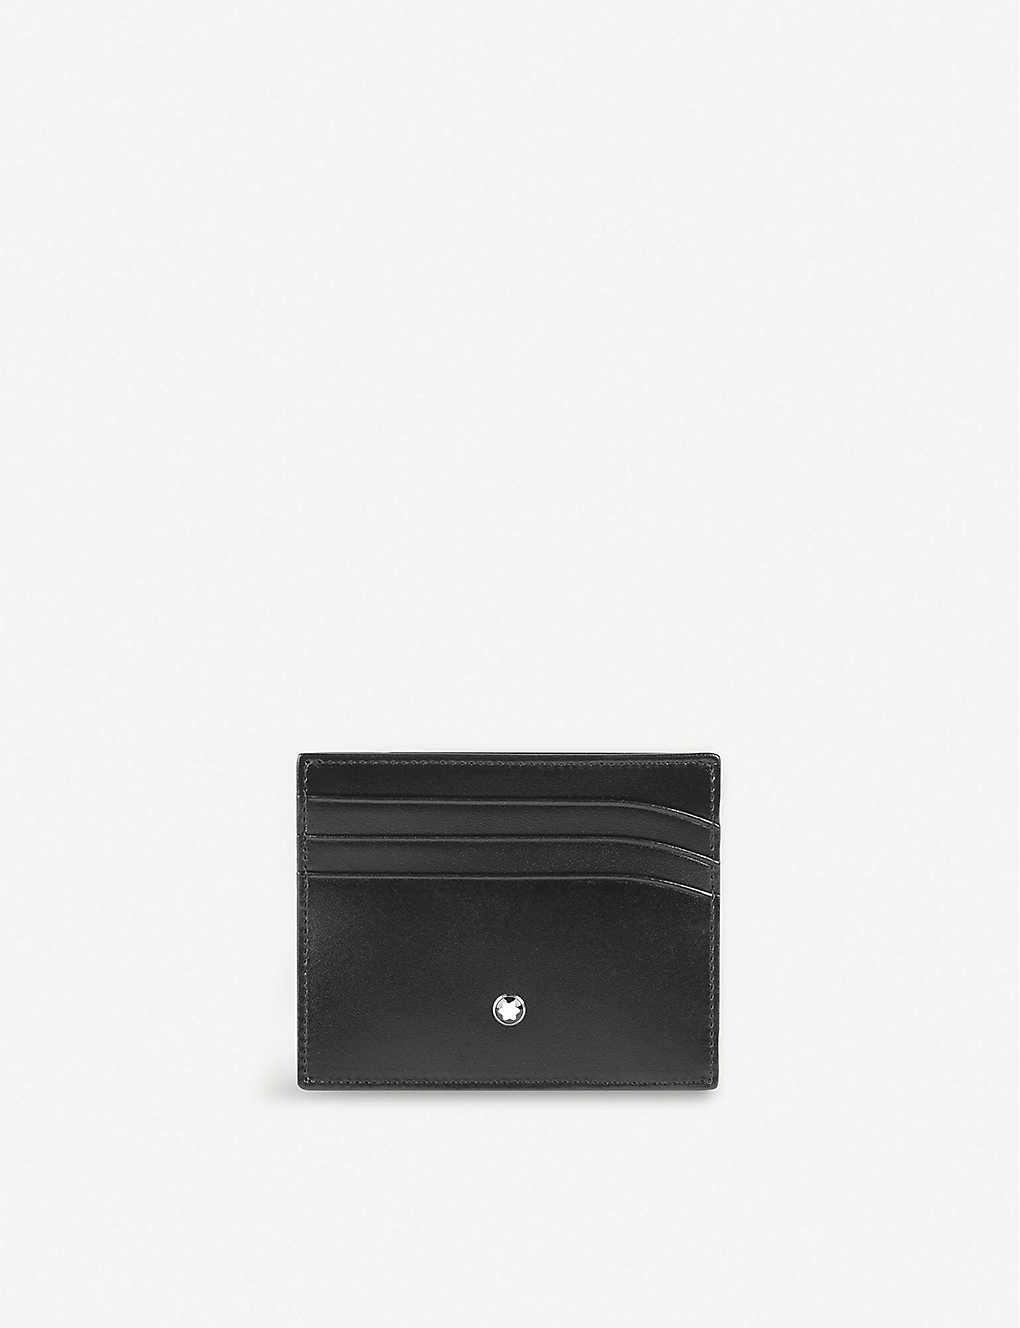 0e2d5a872d MONTBLANC - Meisterstück leather 6cc credit card holder   Selfridges.com